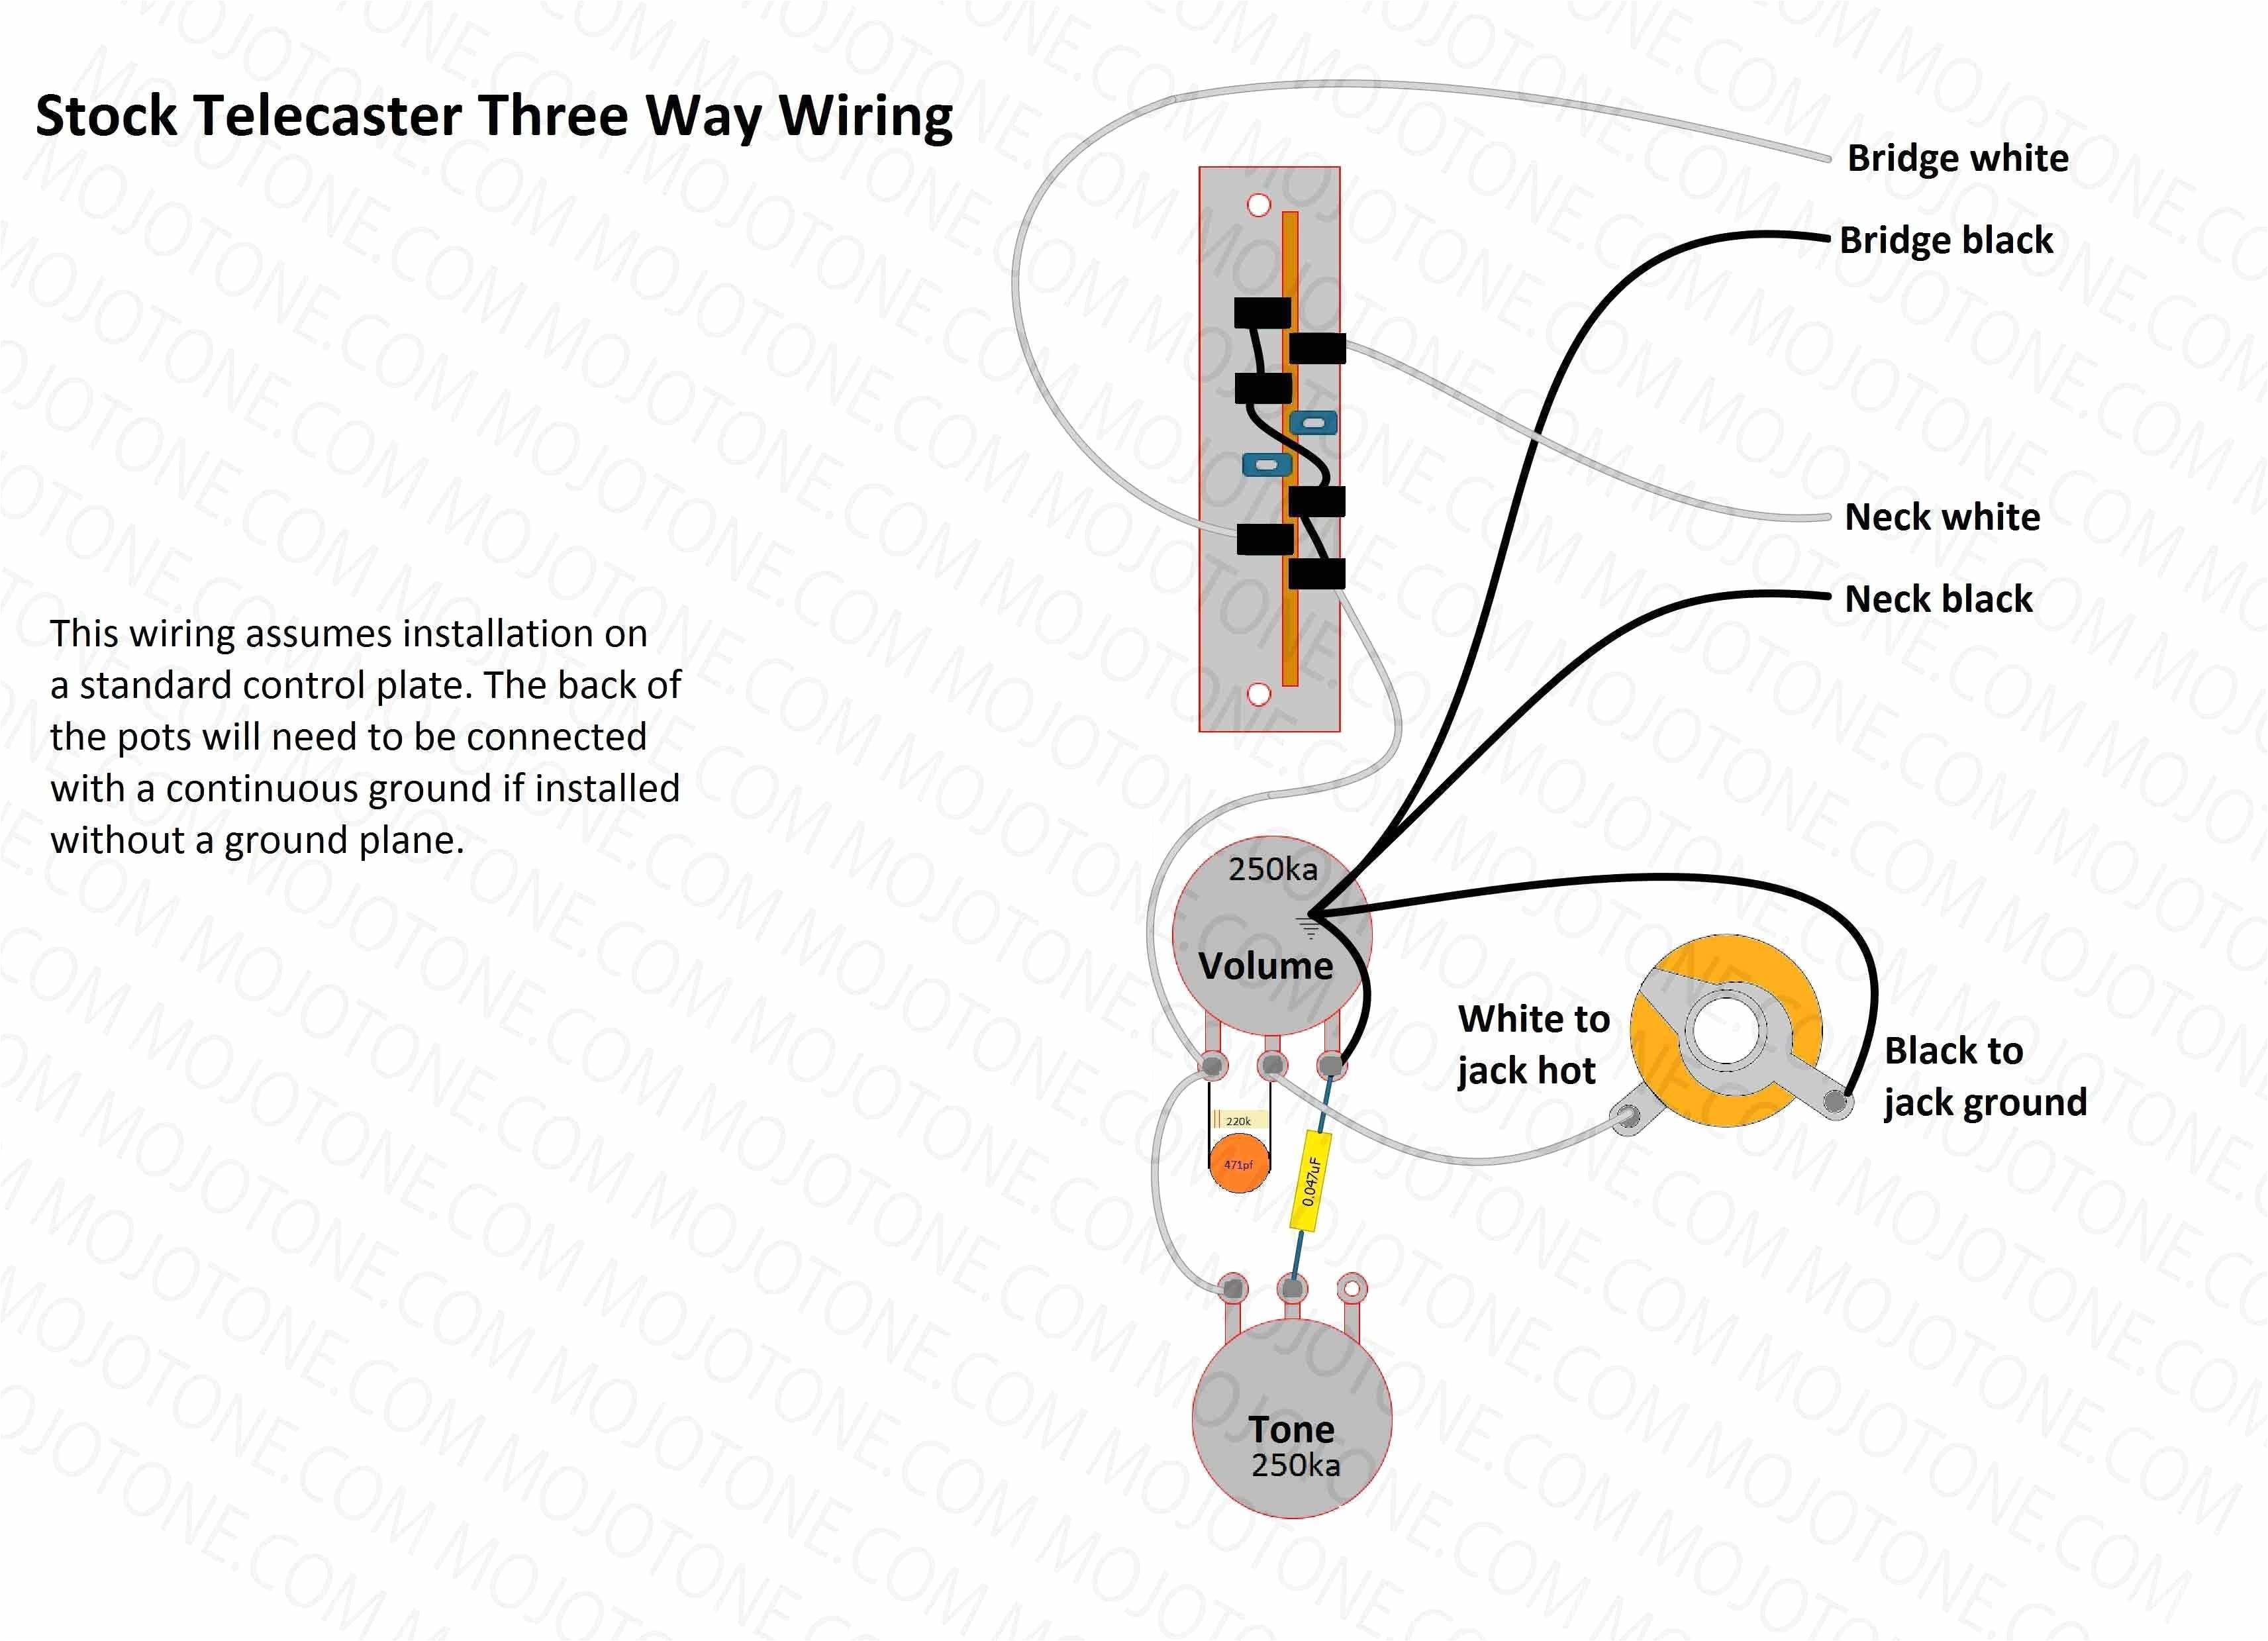 sh telecaster wiring diagram wiring diagram viewfender fsr telecaster wiring diagram wiring diagram description baja telecaster